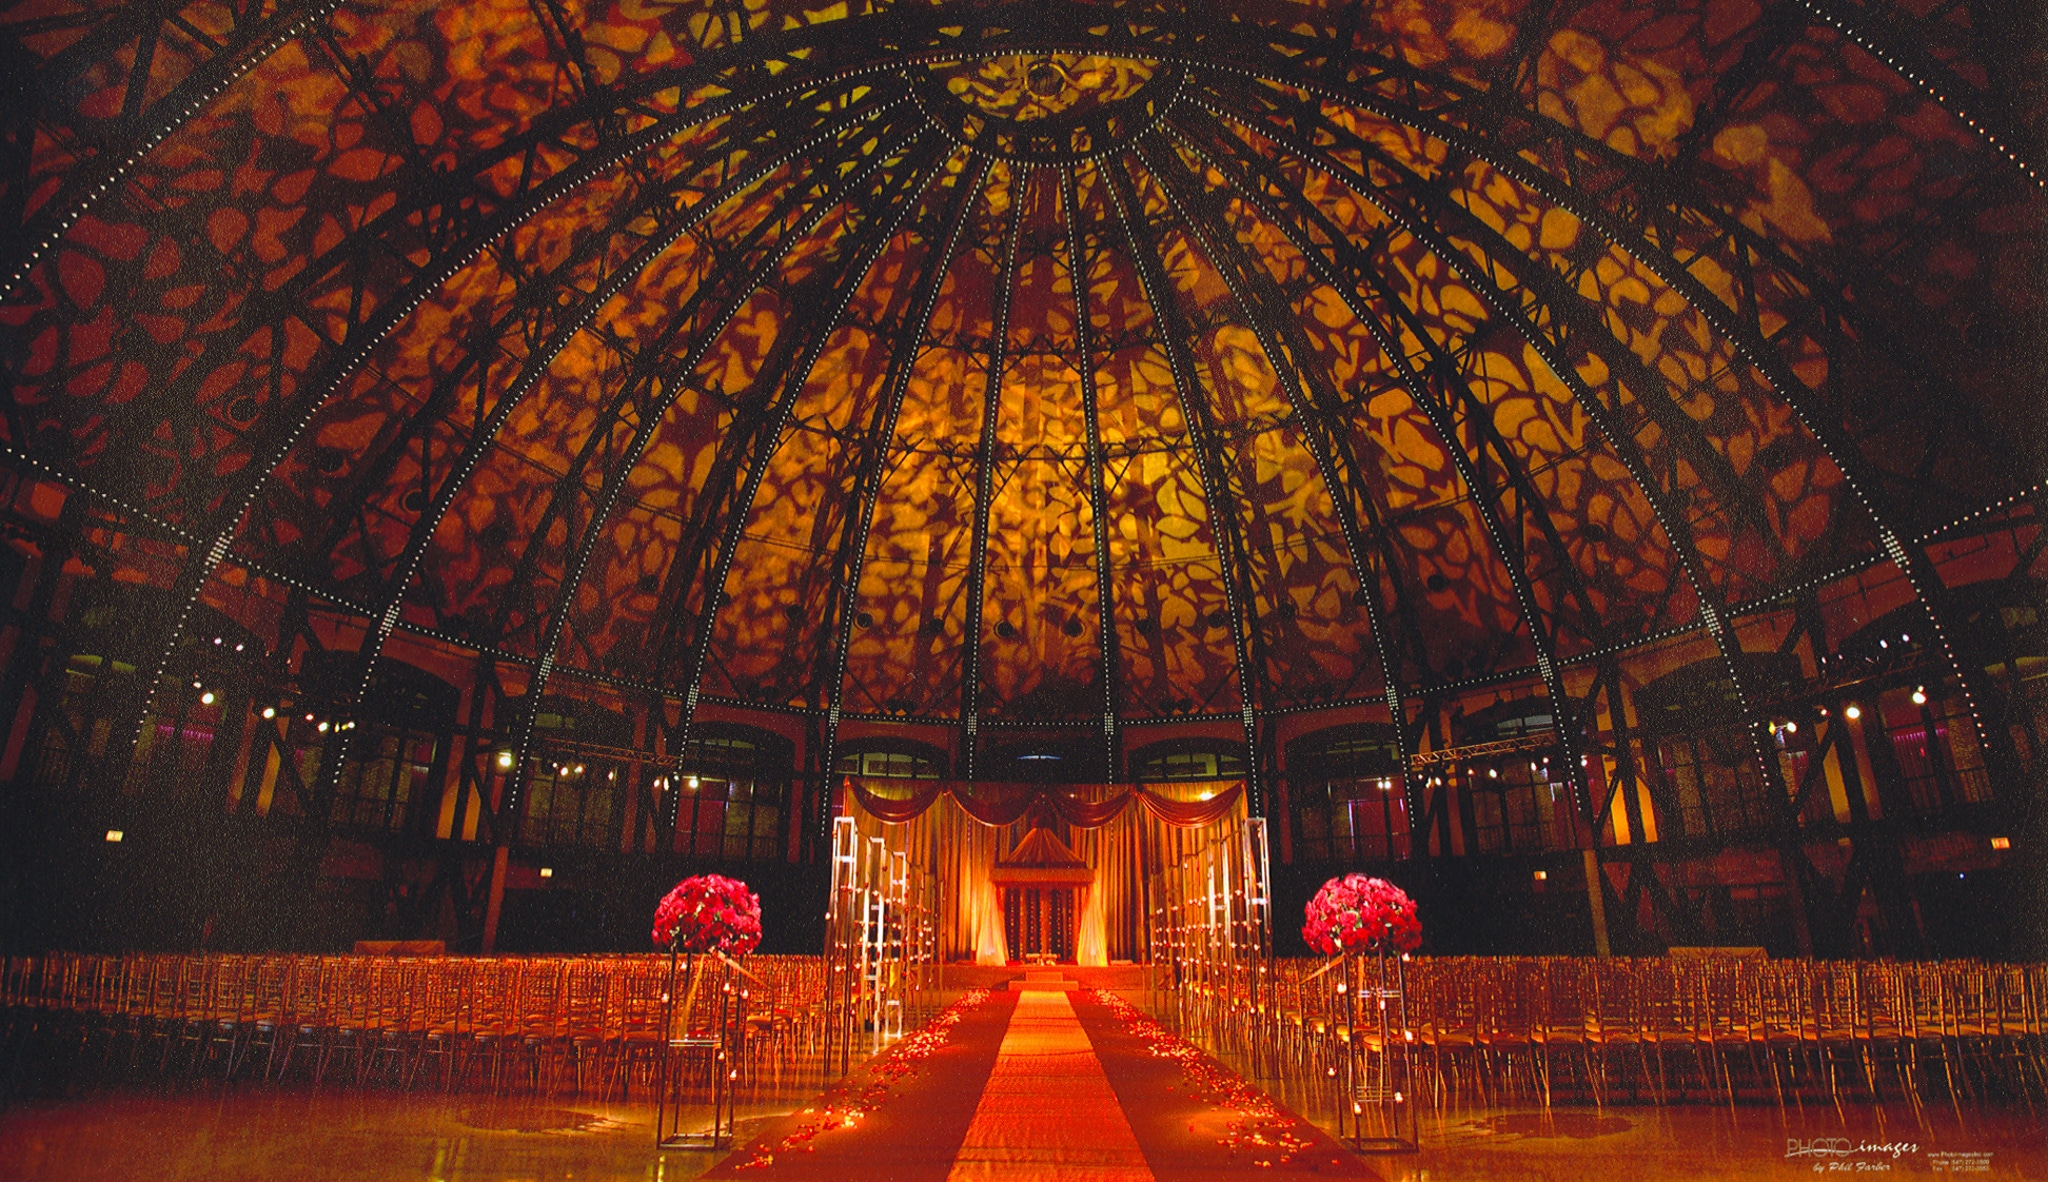 Chicago Landmark - Navy Pier - DOME INDIAN WEDDING